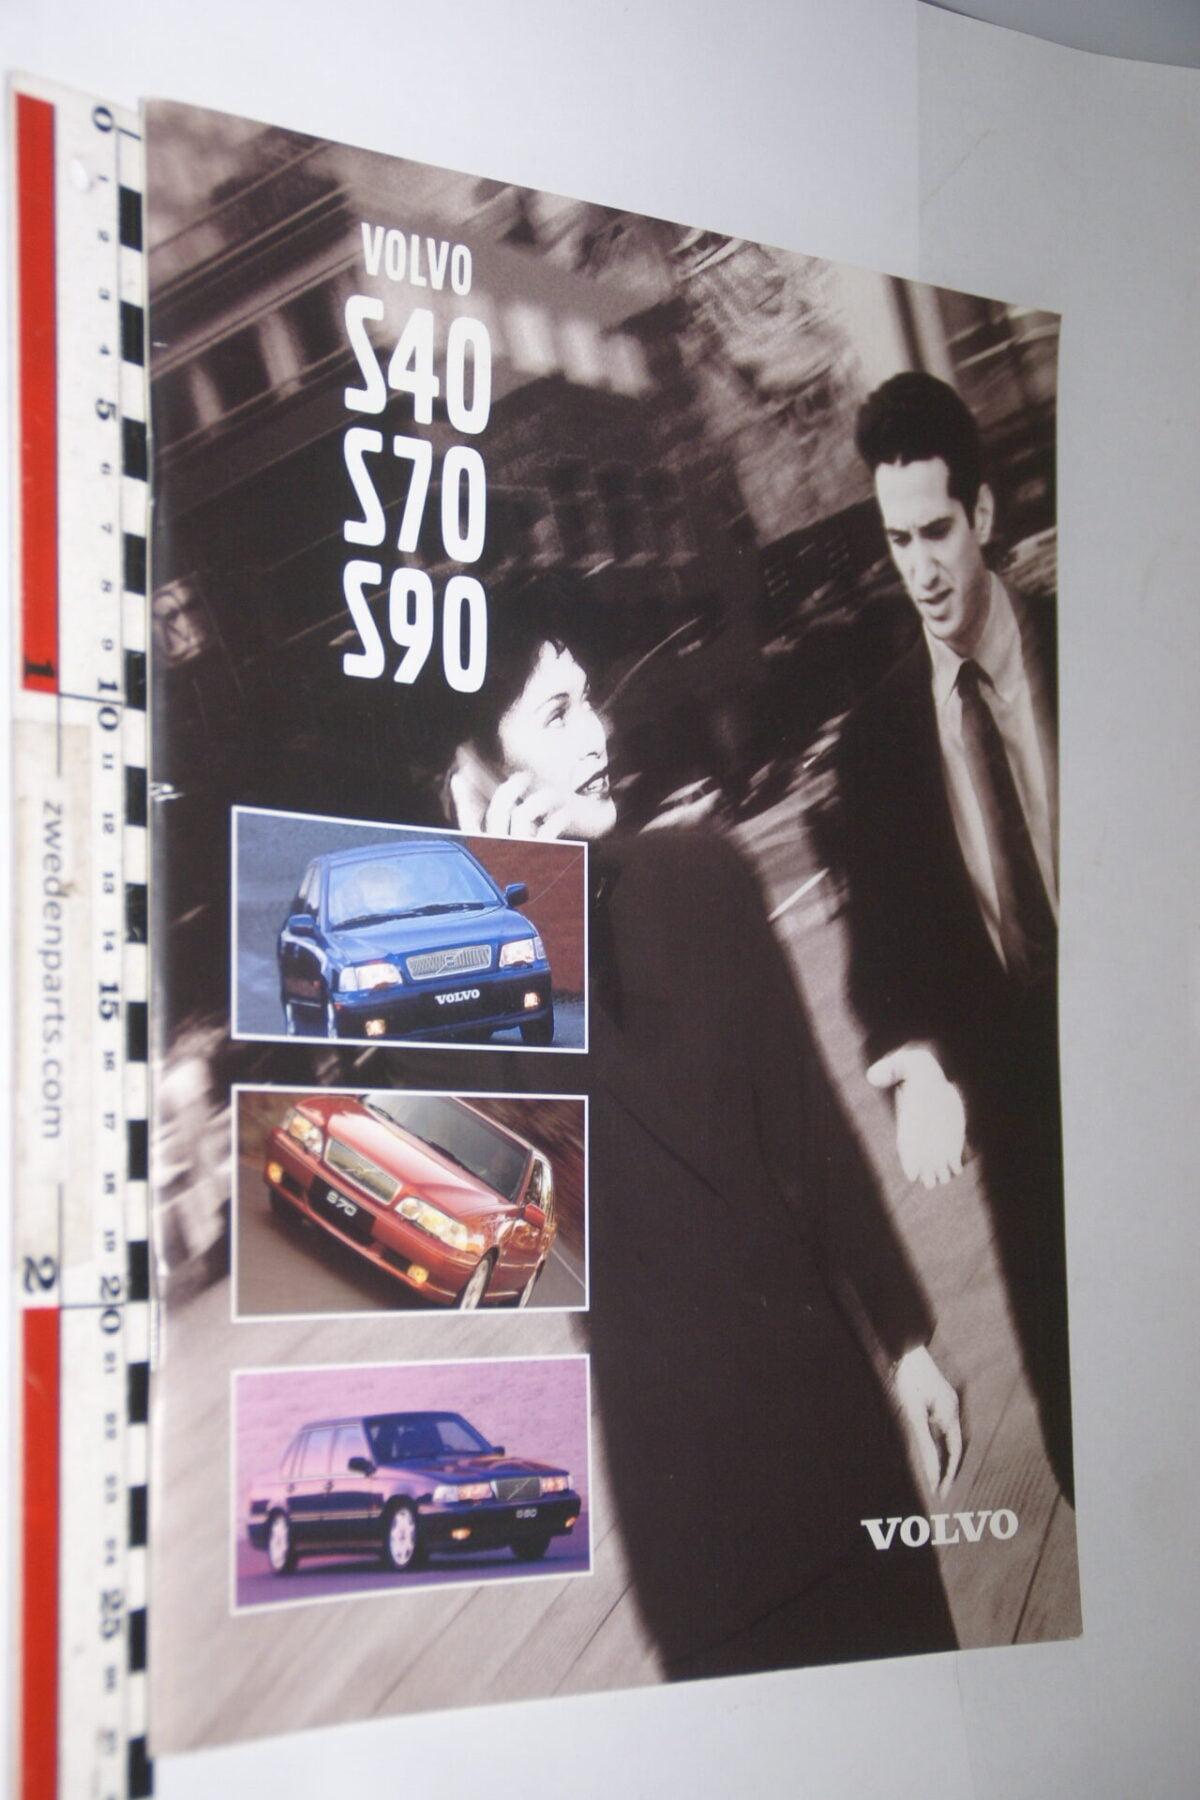 DSC04745 1997 originele brochure Volvo S40 S70 S90 nr C0897-8eaa7f47